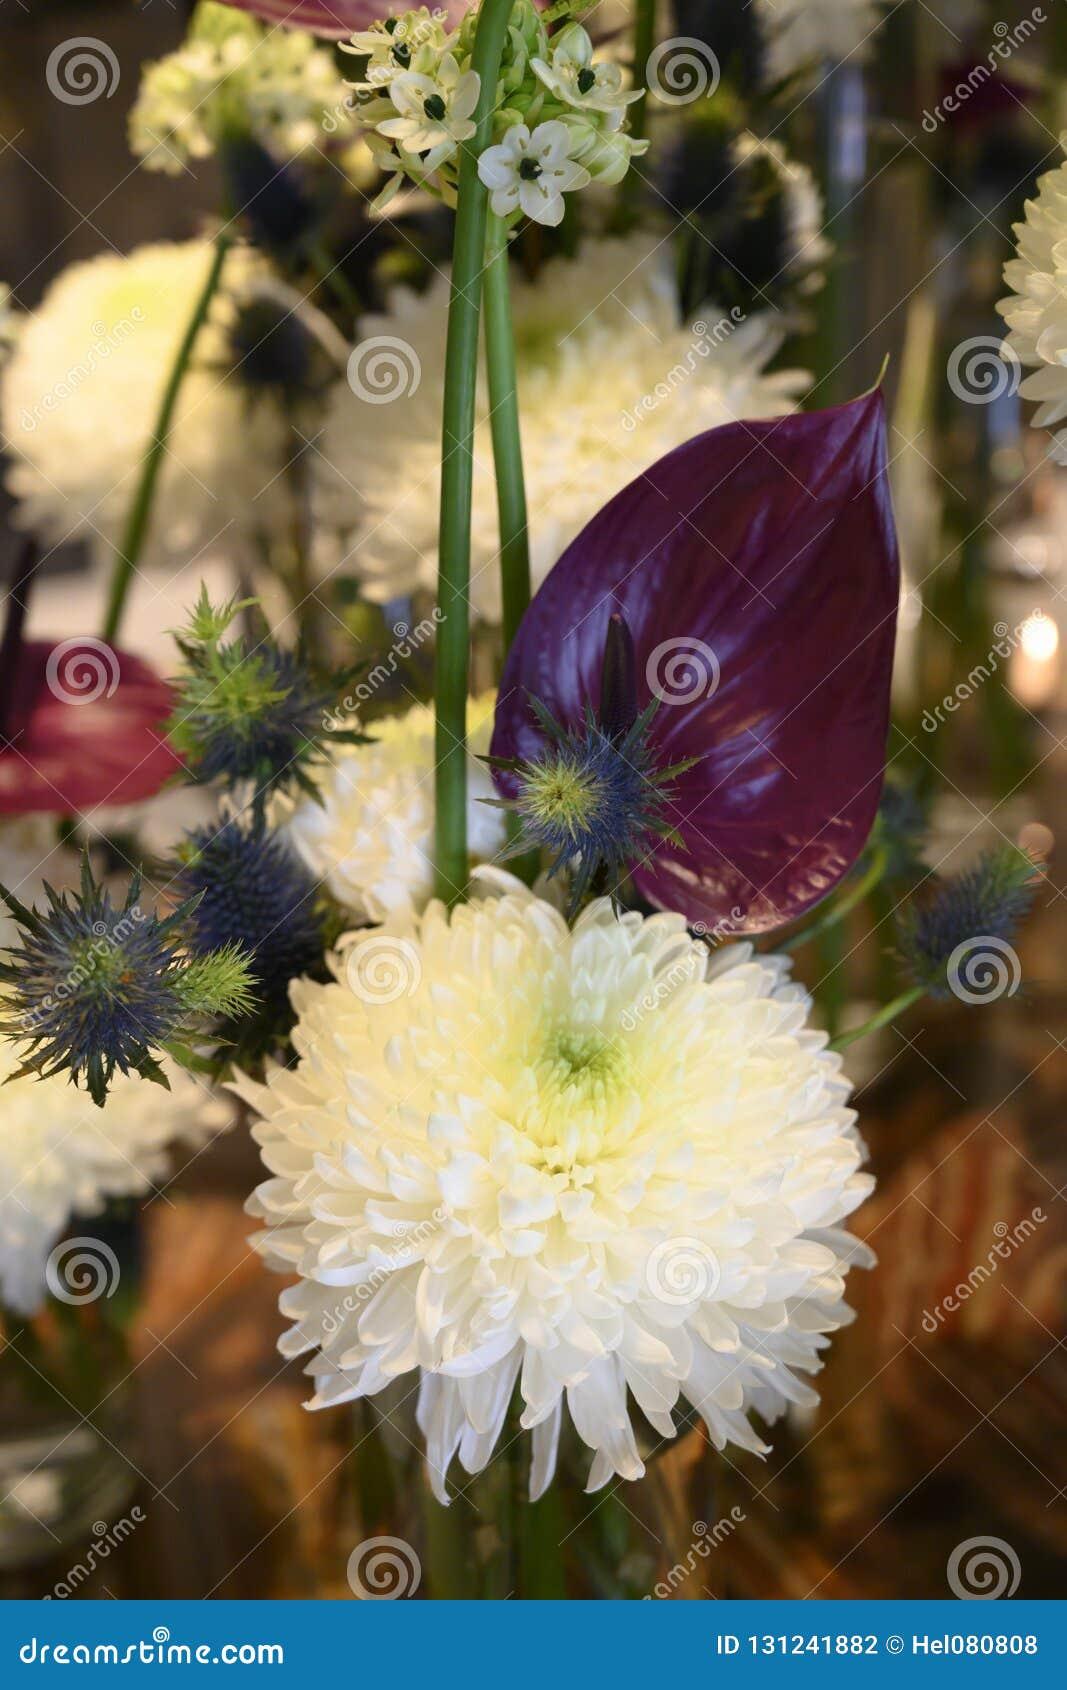 White Winter Flower Dream With Chrysanthemum Anturia Fern Thistle